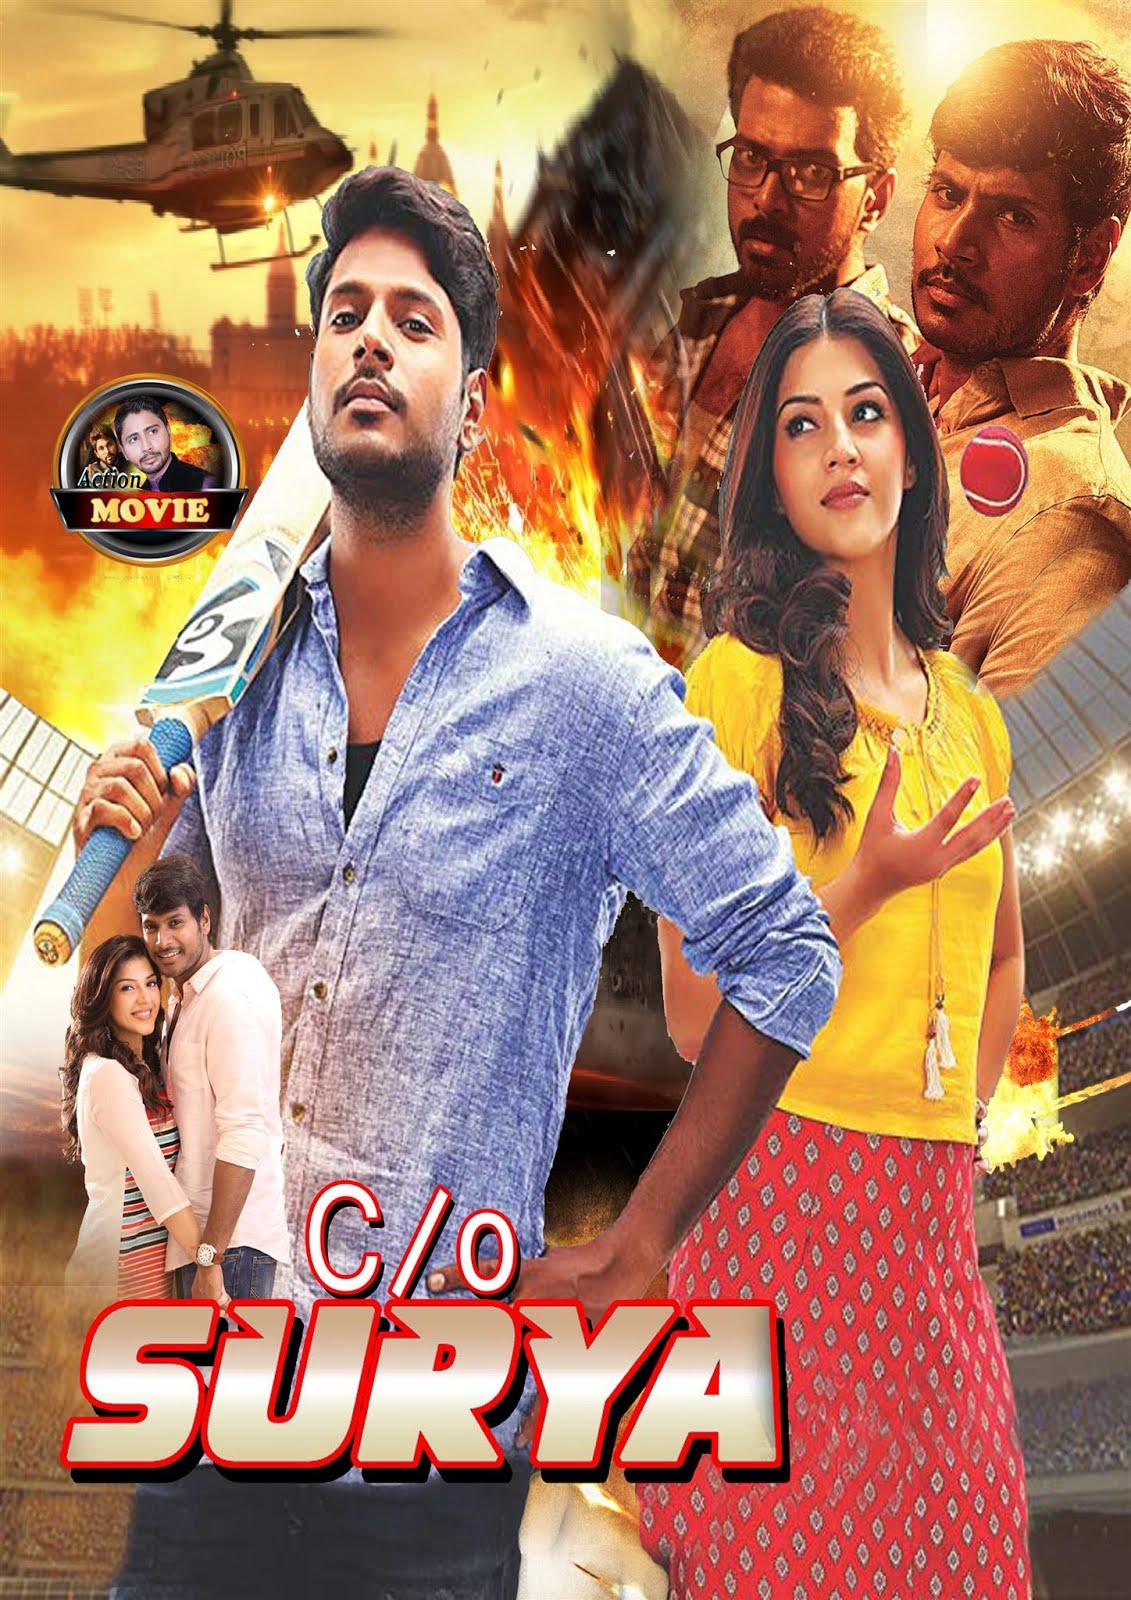 C/o. Surya (Nenjil Thunivirundhal) 2018 Hindi Dubbed HDRip x264 700MB